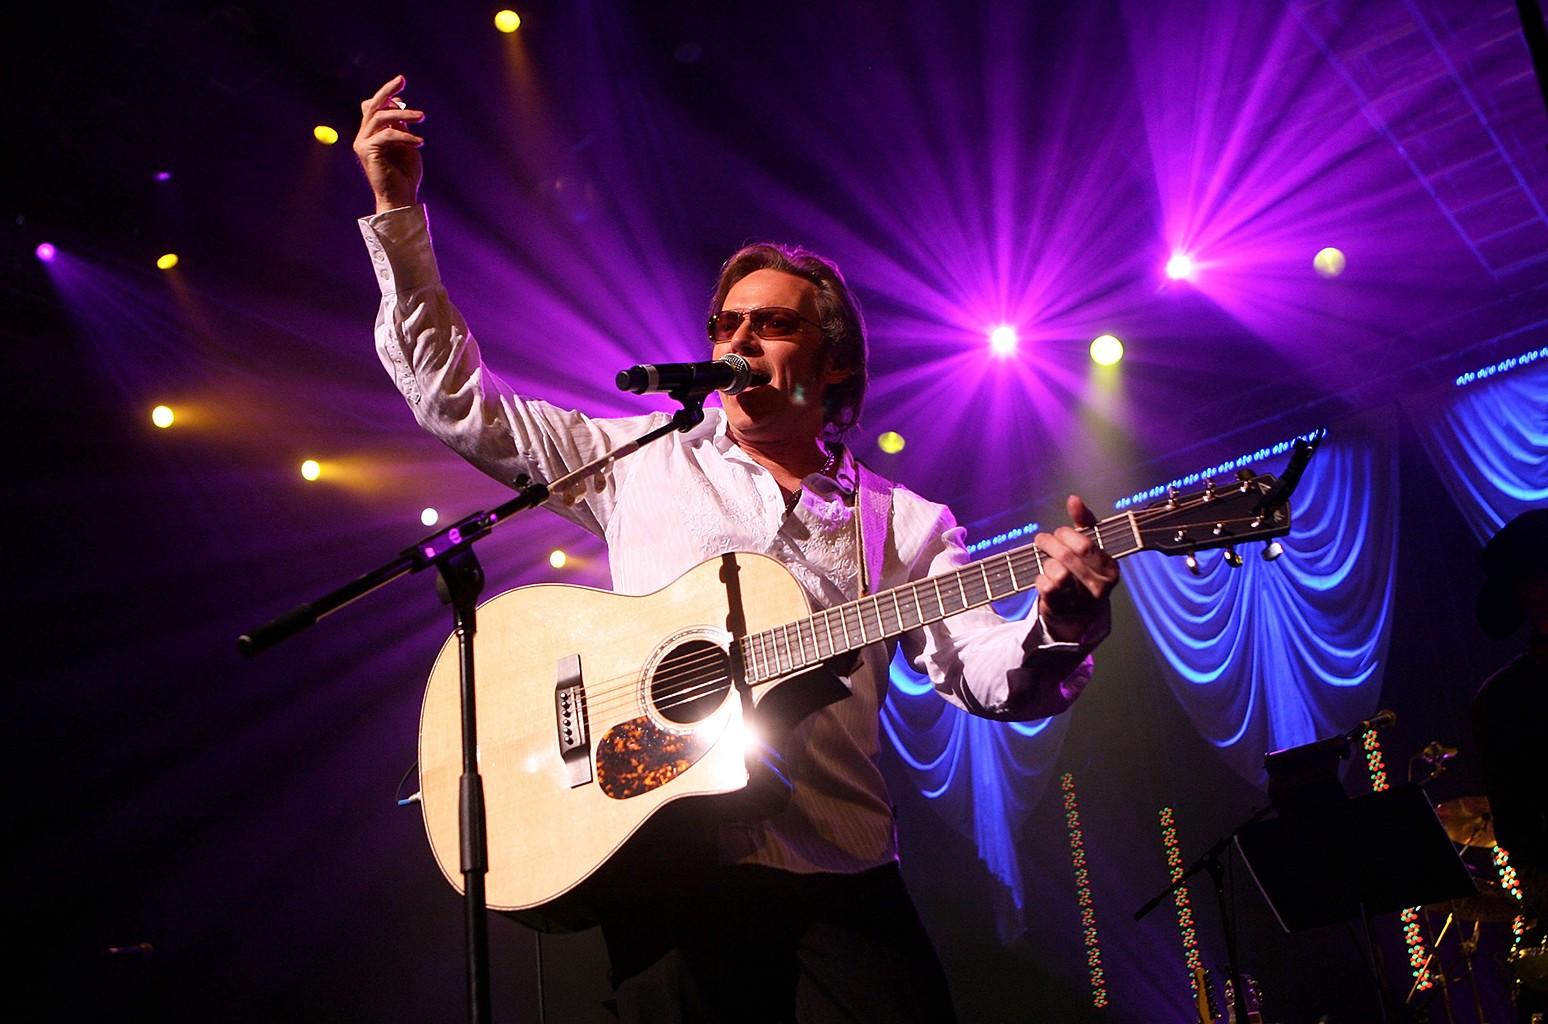 Terry McBride performs in Las Vegas.